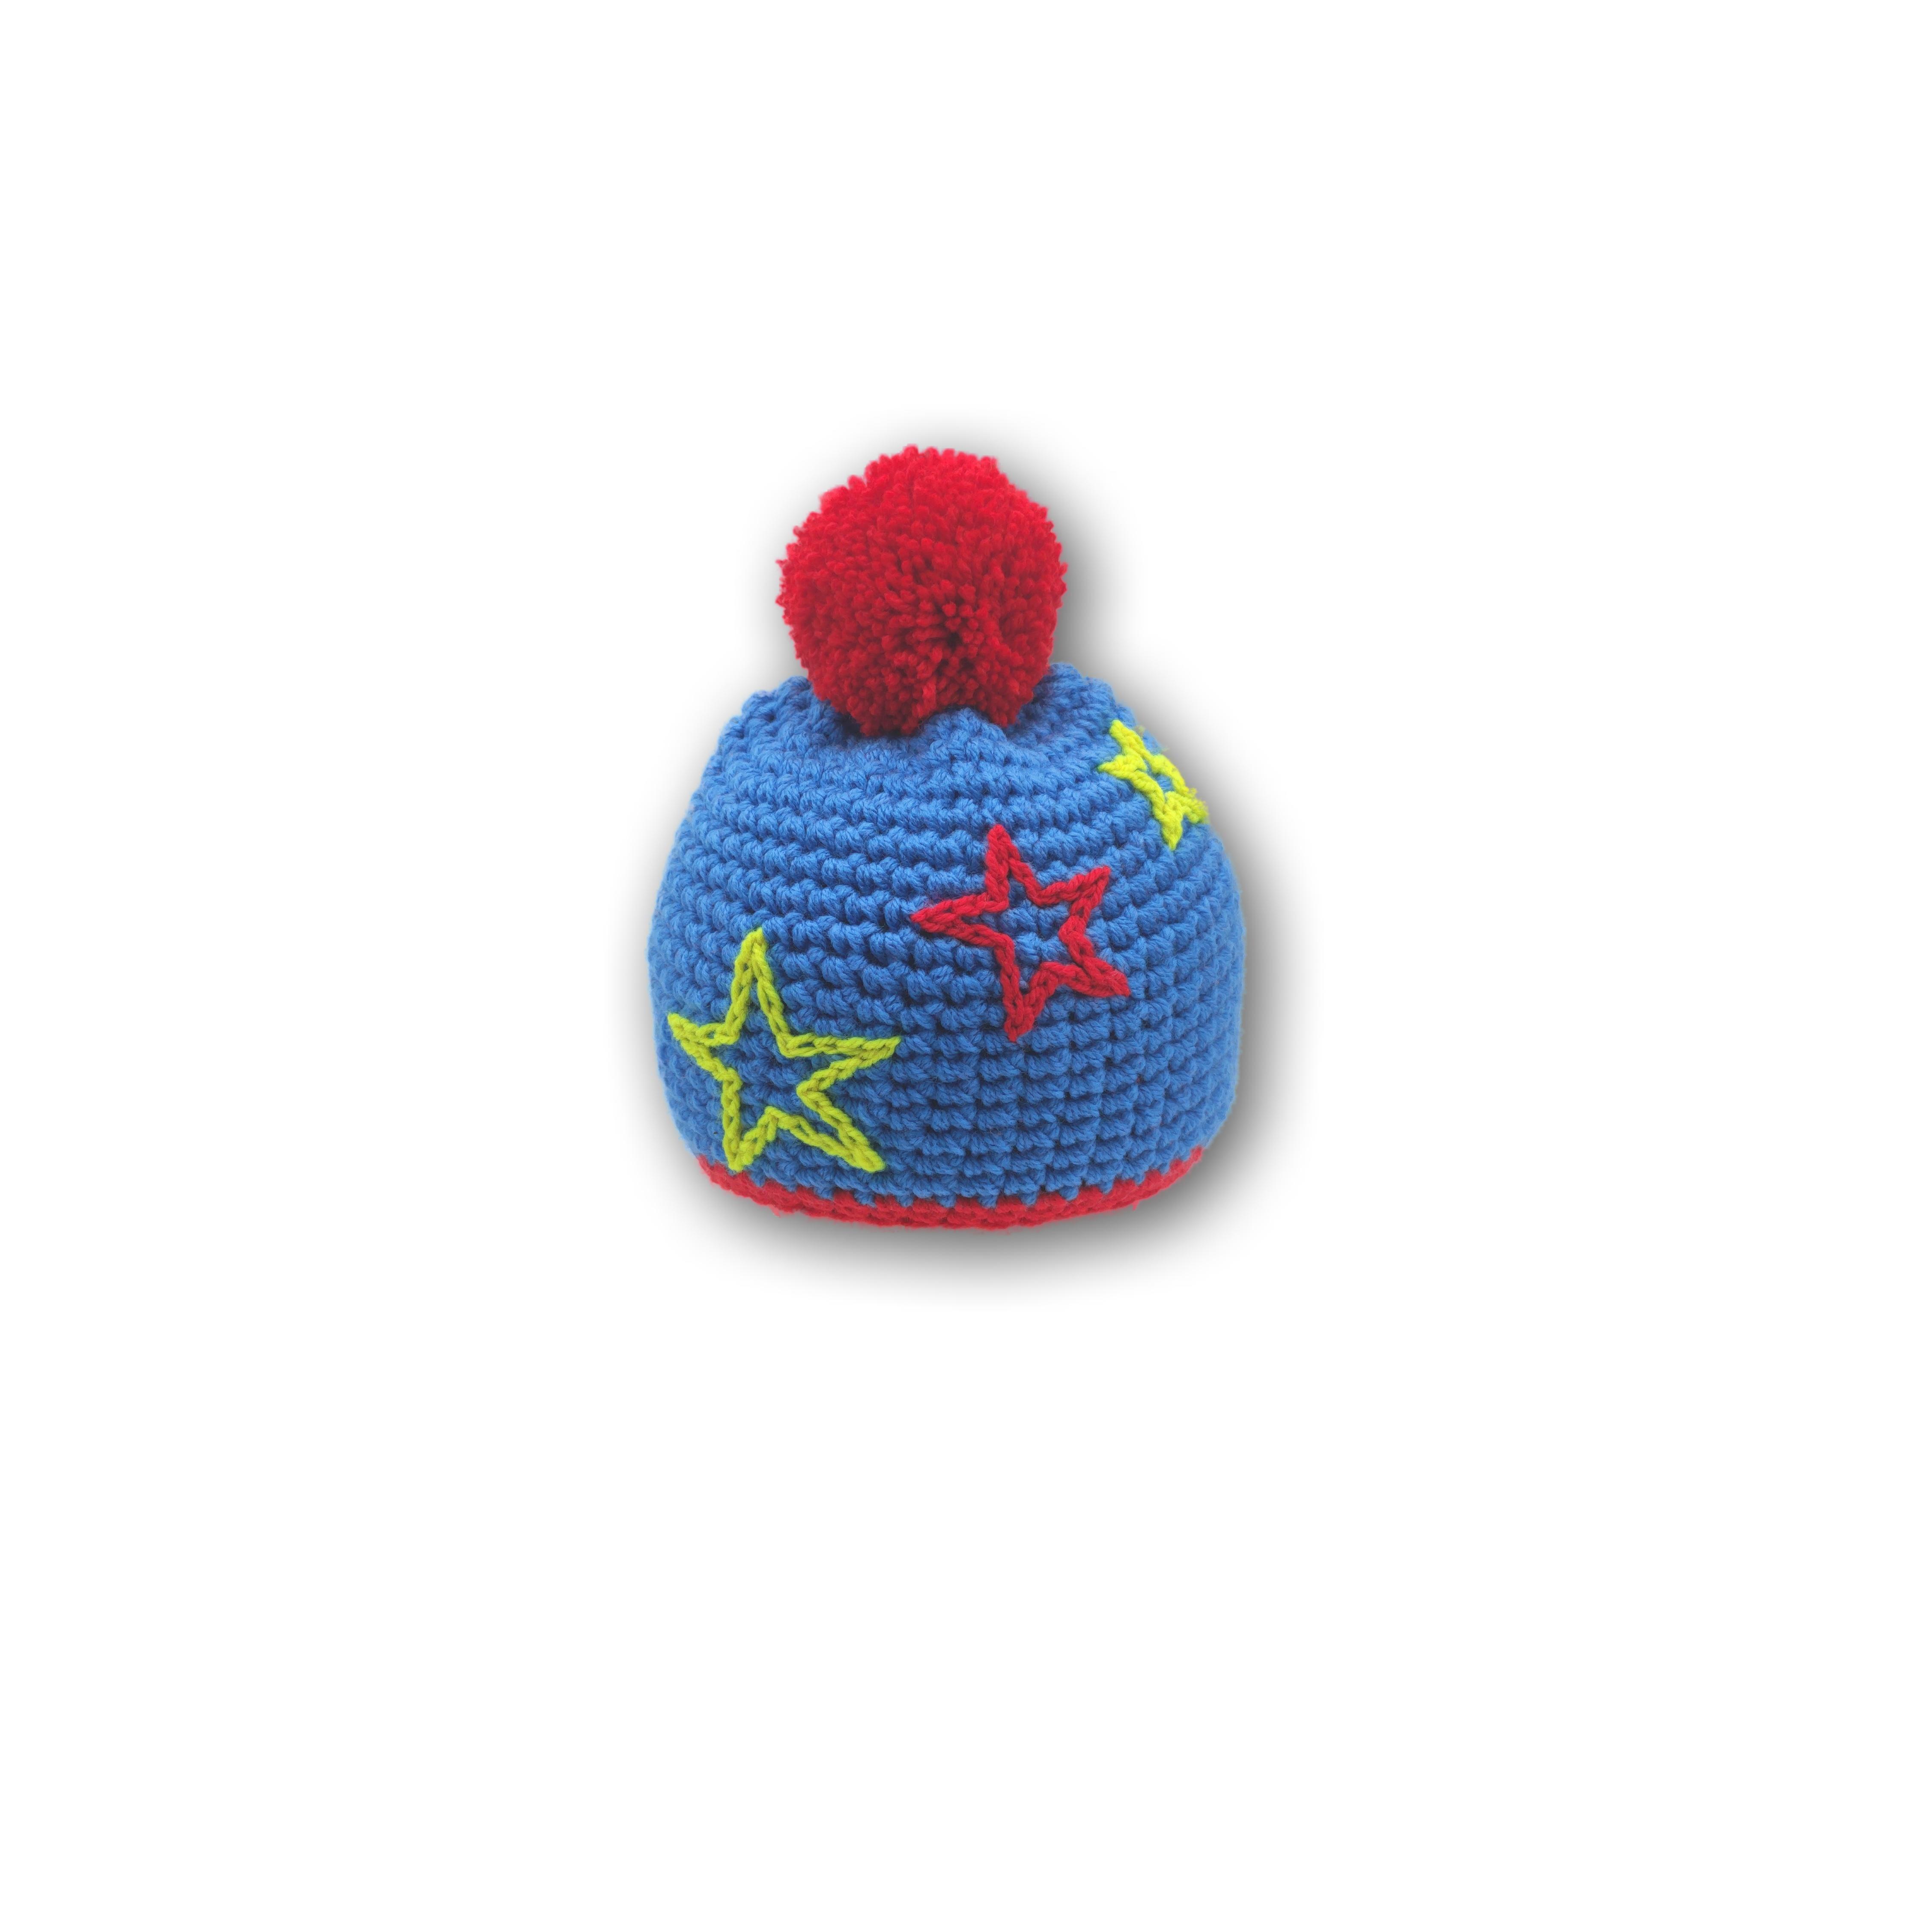 kinder mütze blau rot gelb